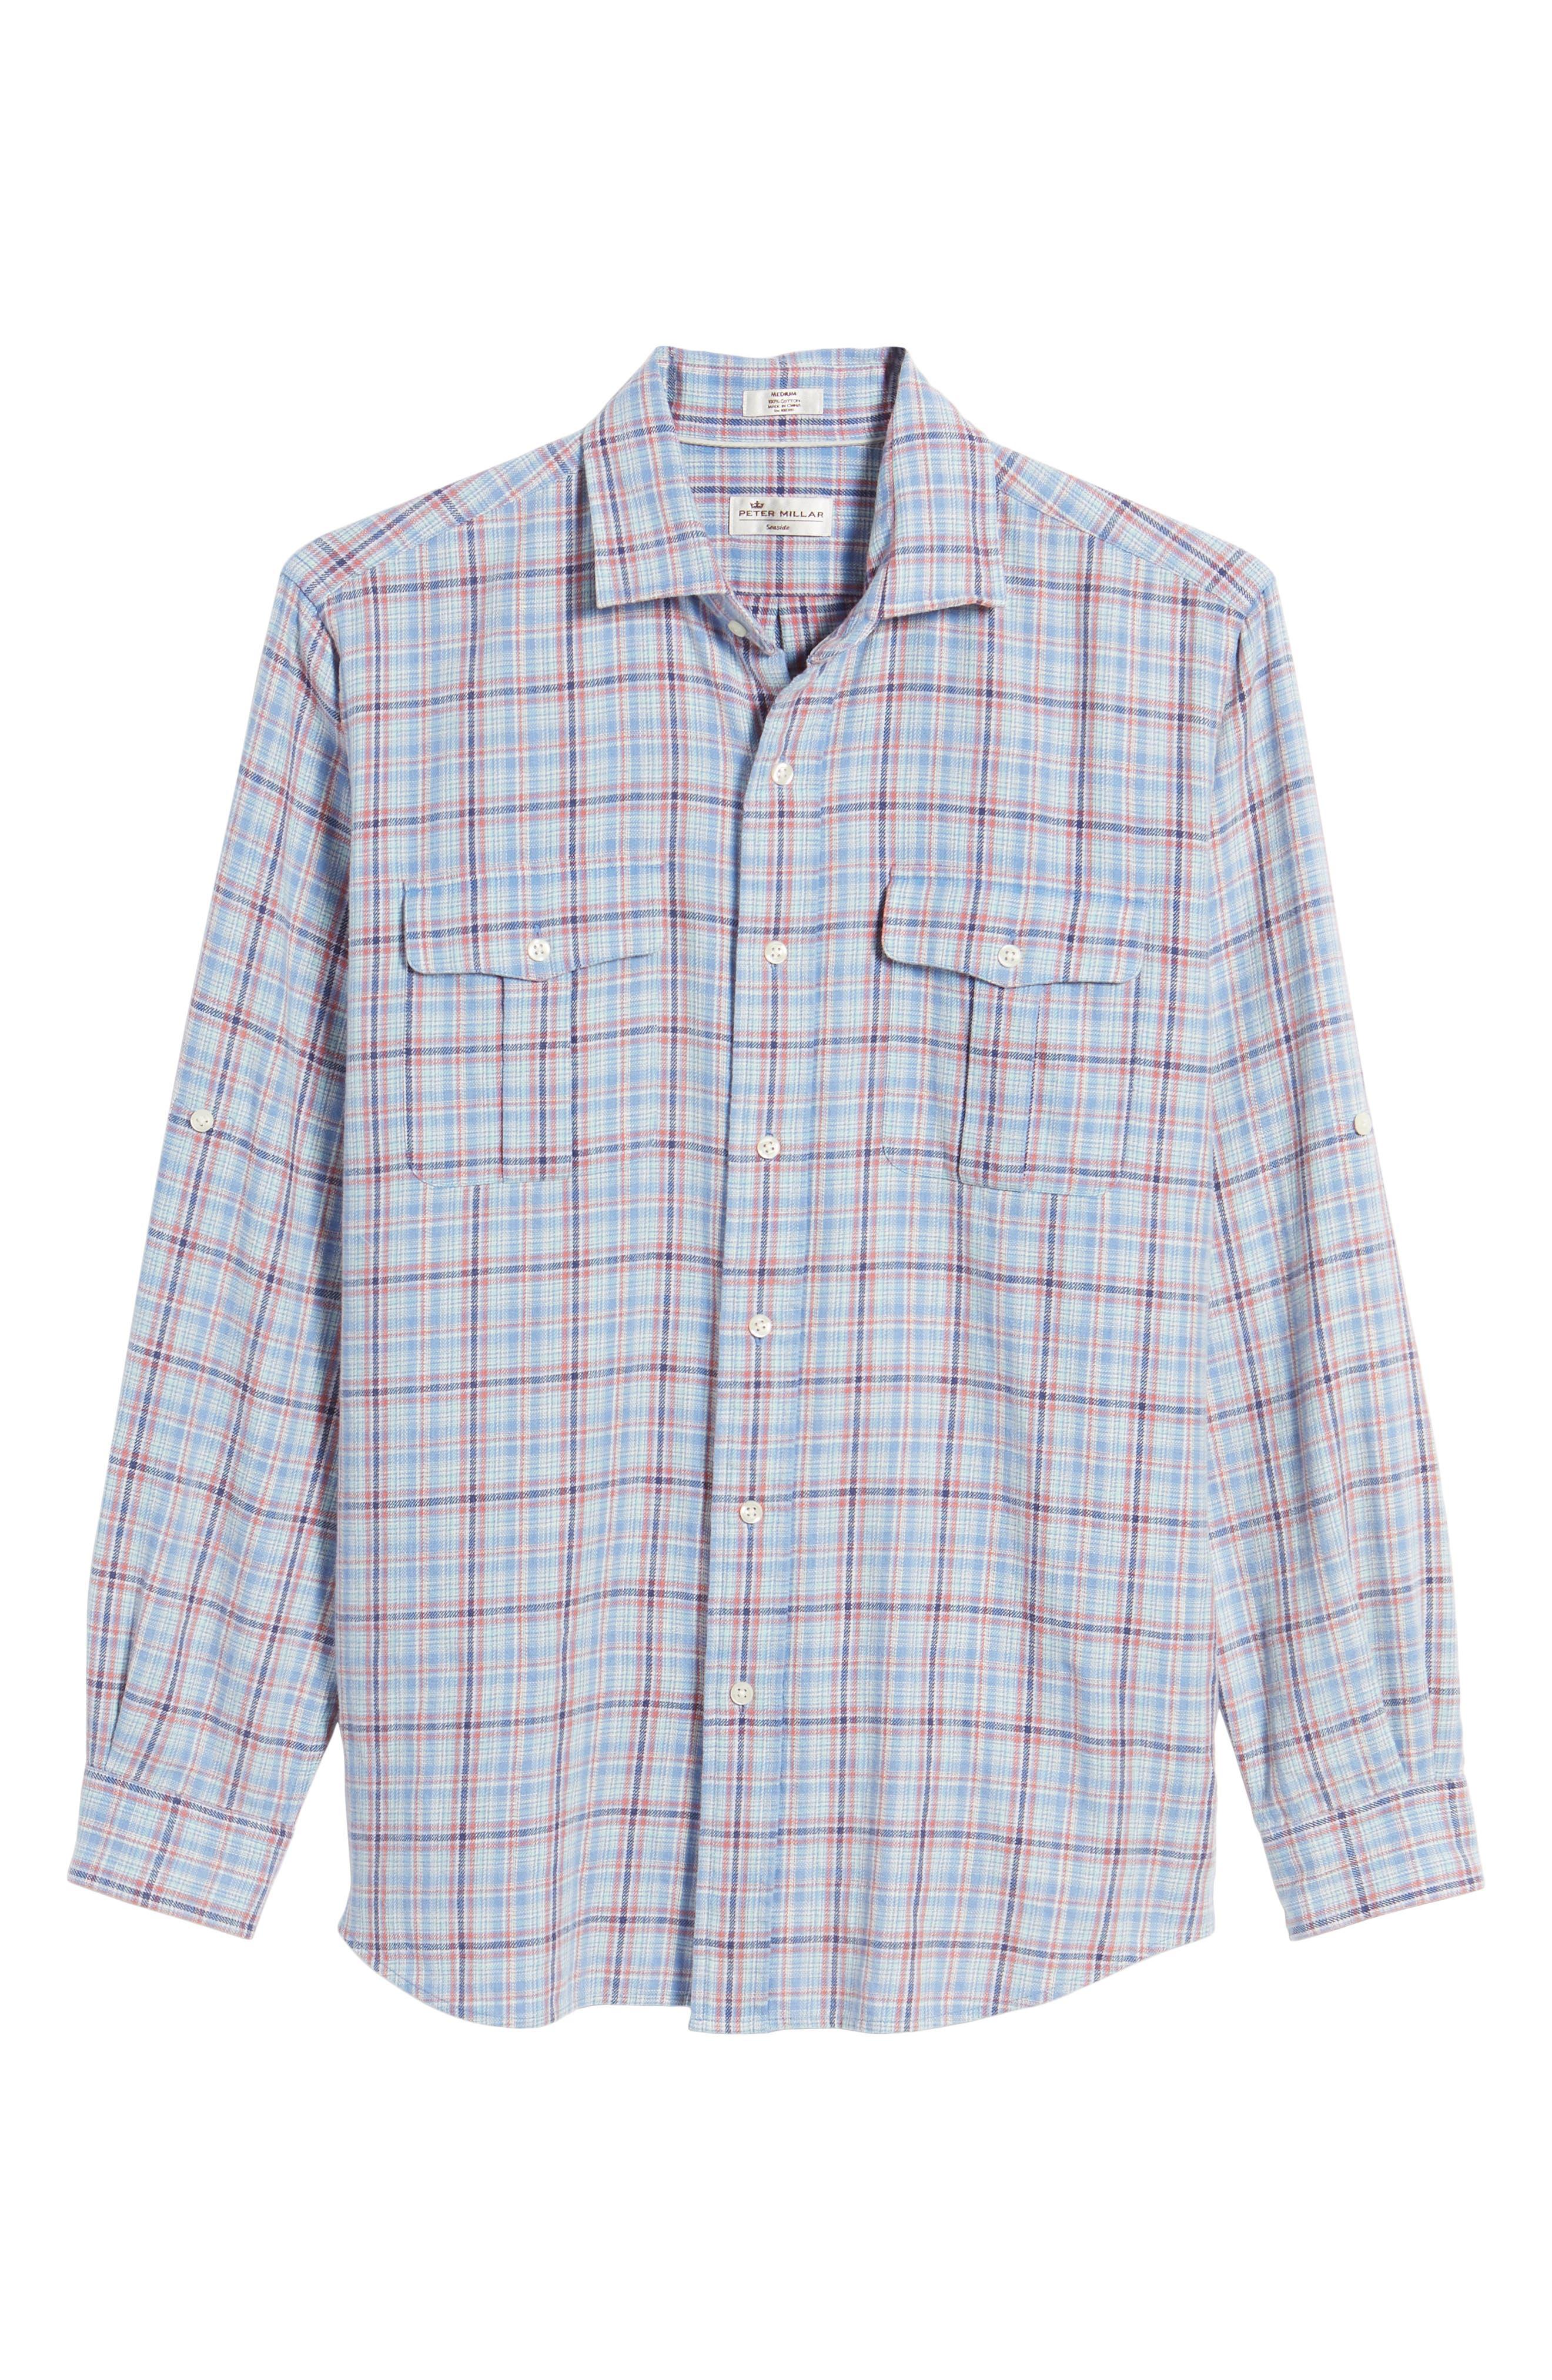 Emerald Isle Regular Fit Plaid Sport Shirt,                             Alternate thumbnail 6, color,